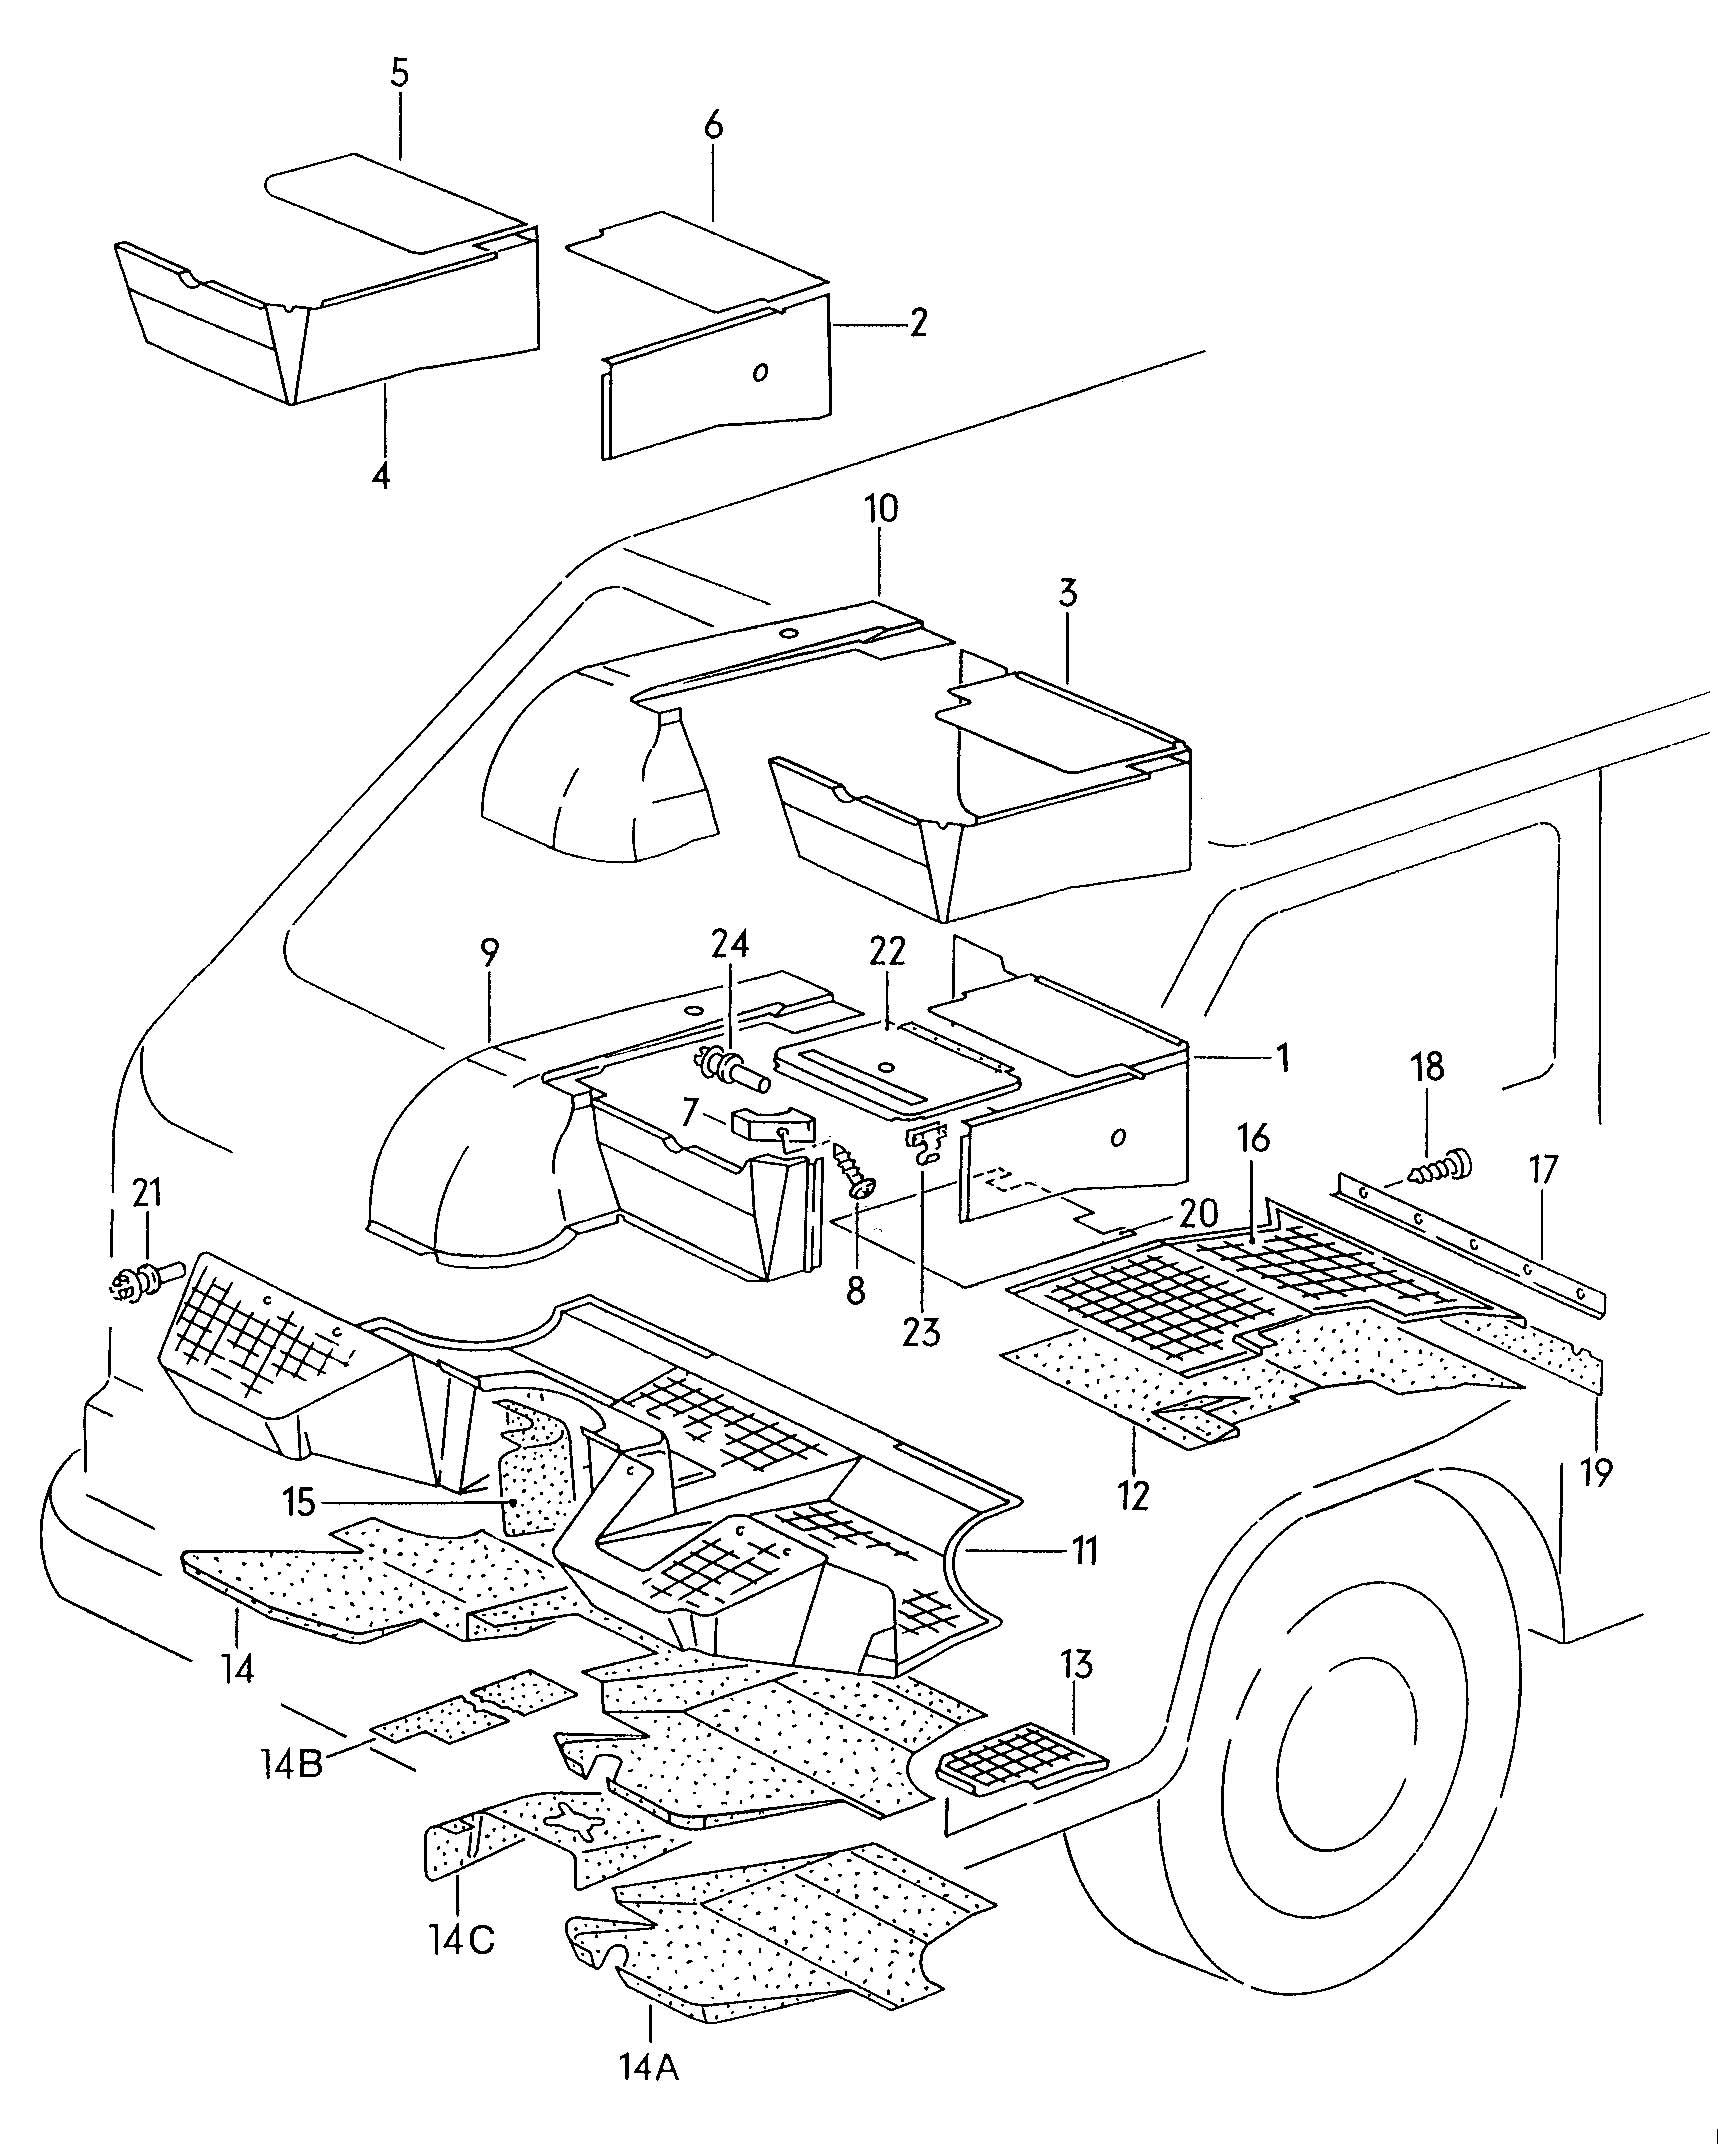 [2007 Porsche Boxster Wiring Diagram Manual Download